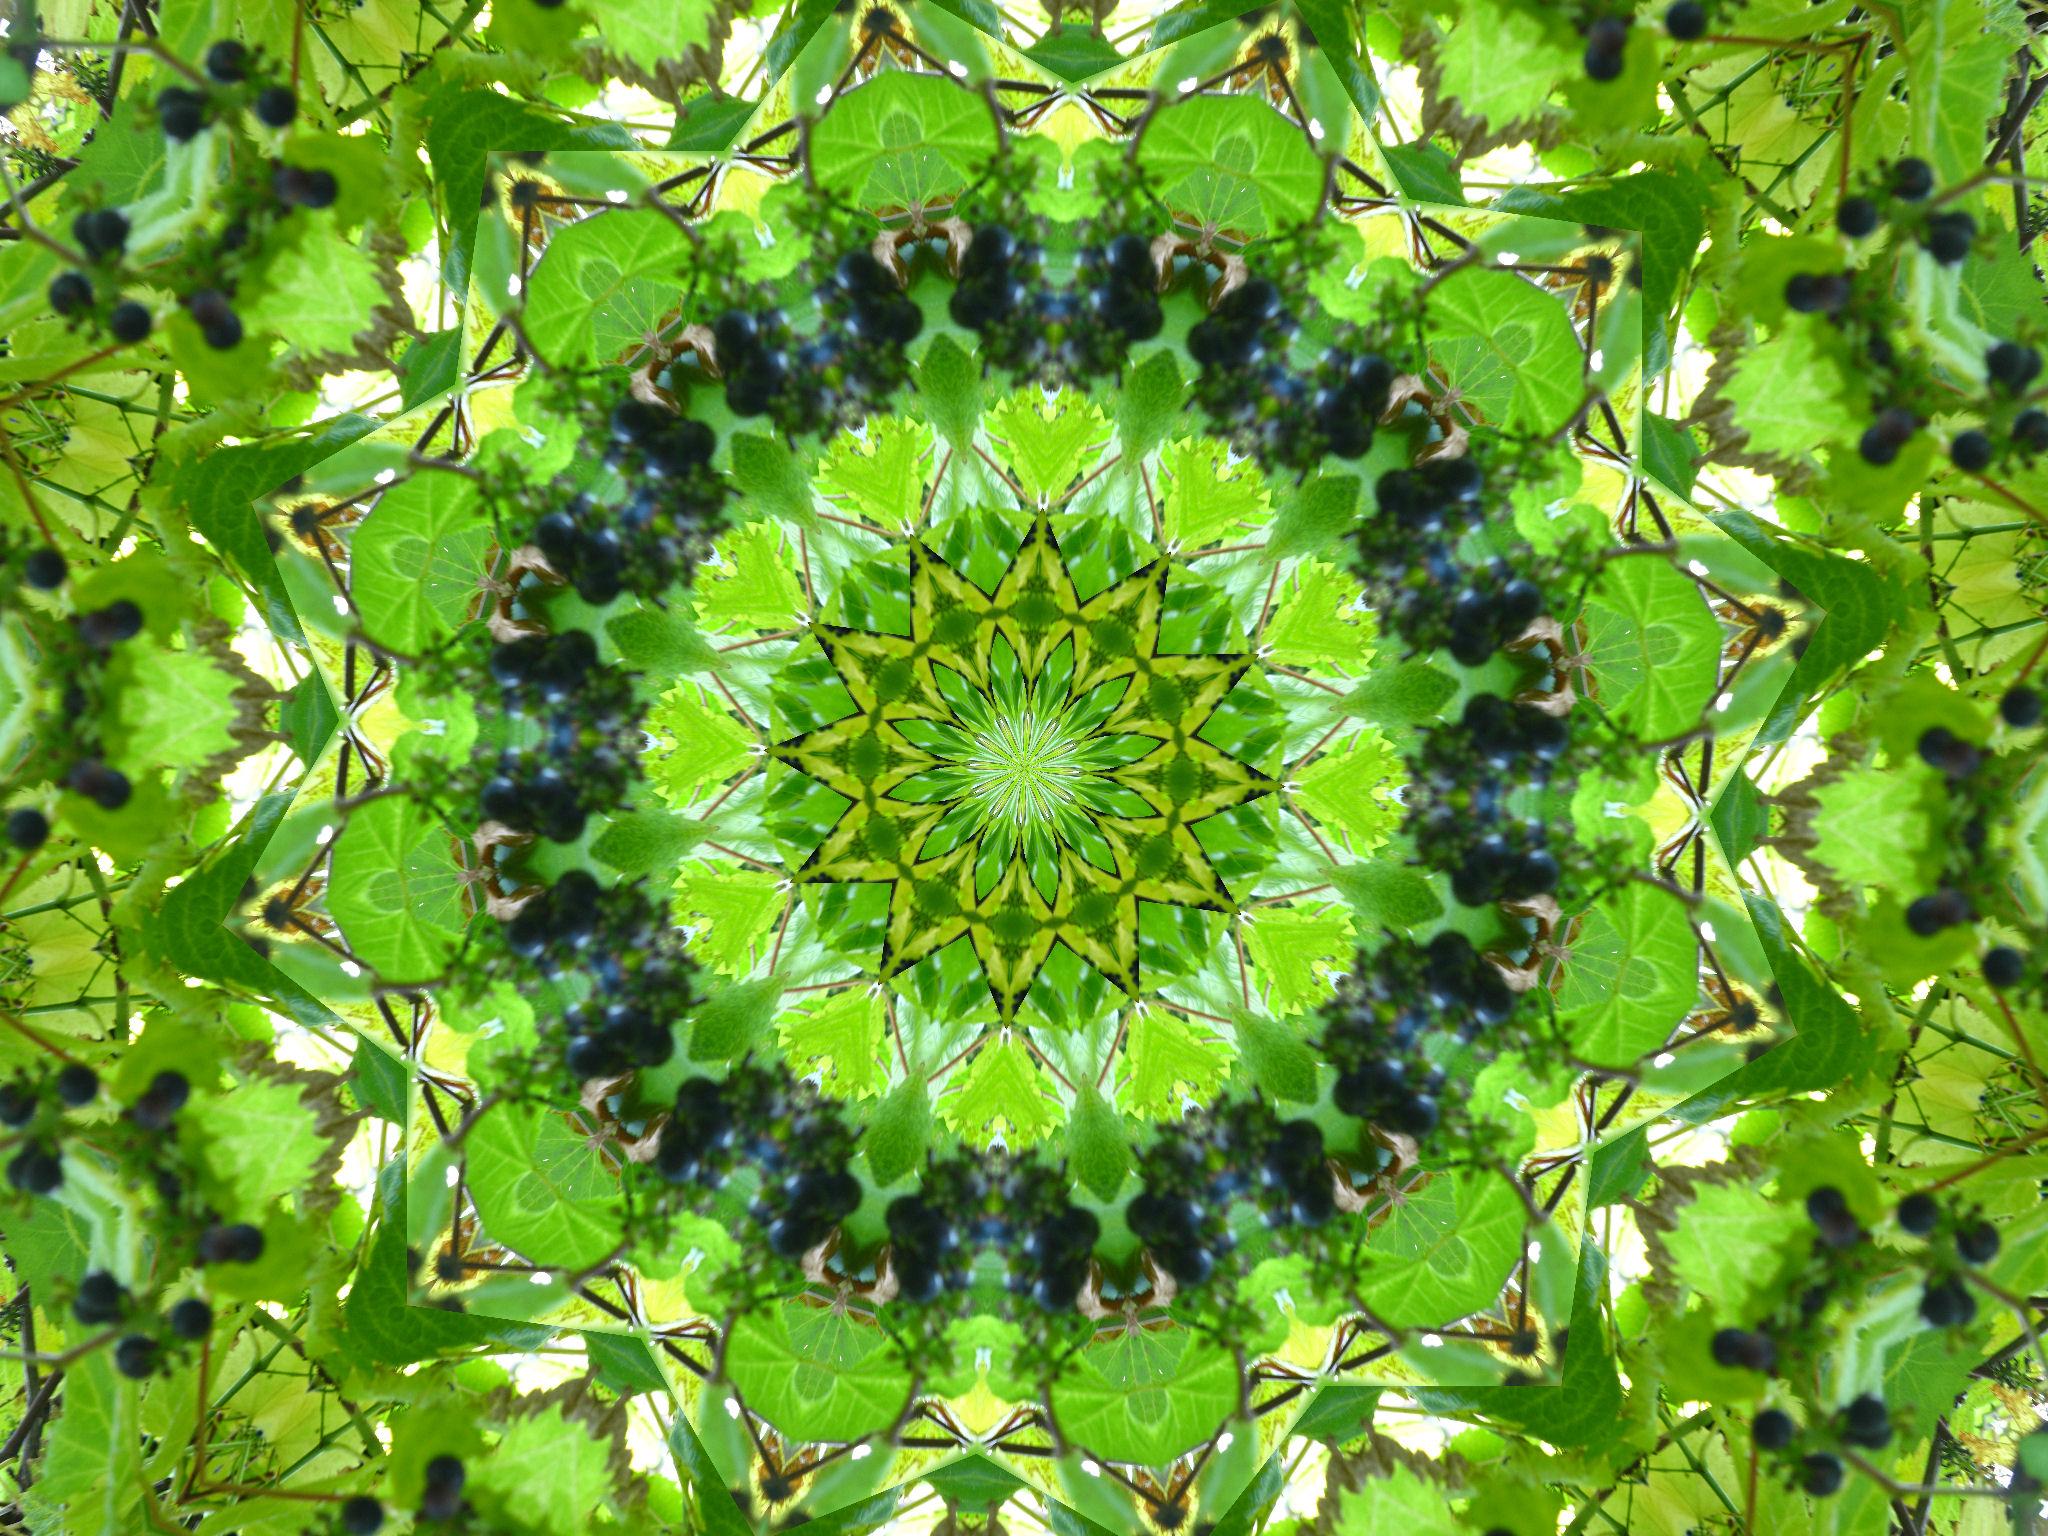 kaleidoscope___leaves_grapes_2_by_rohar-d3kzlkc